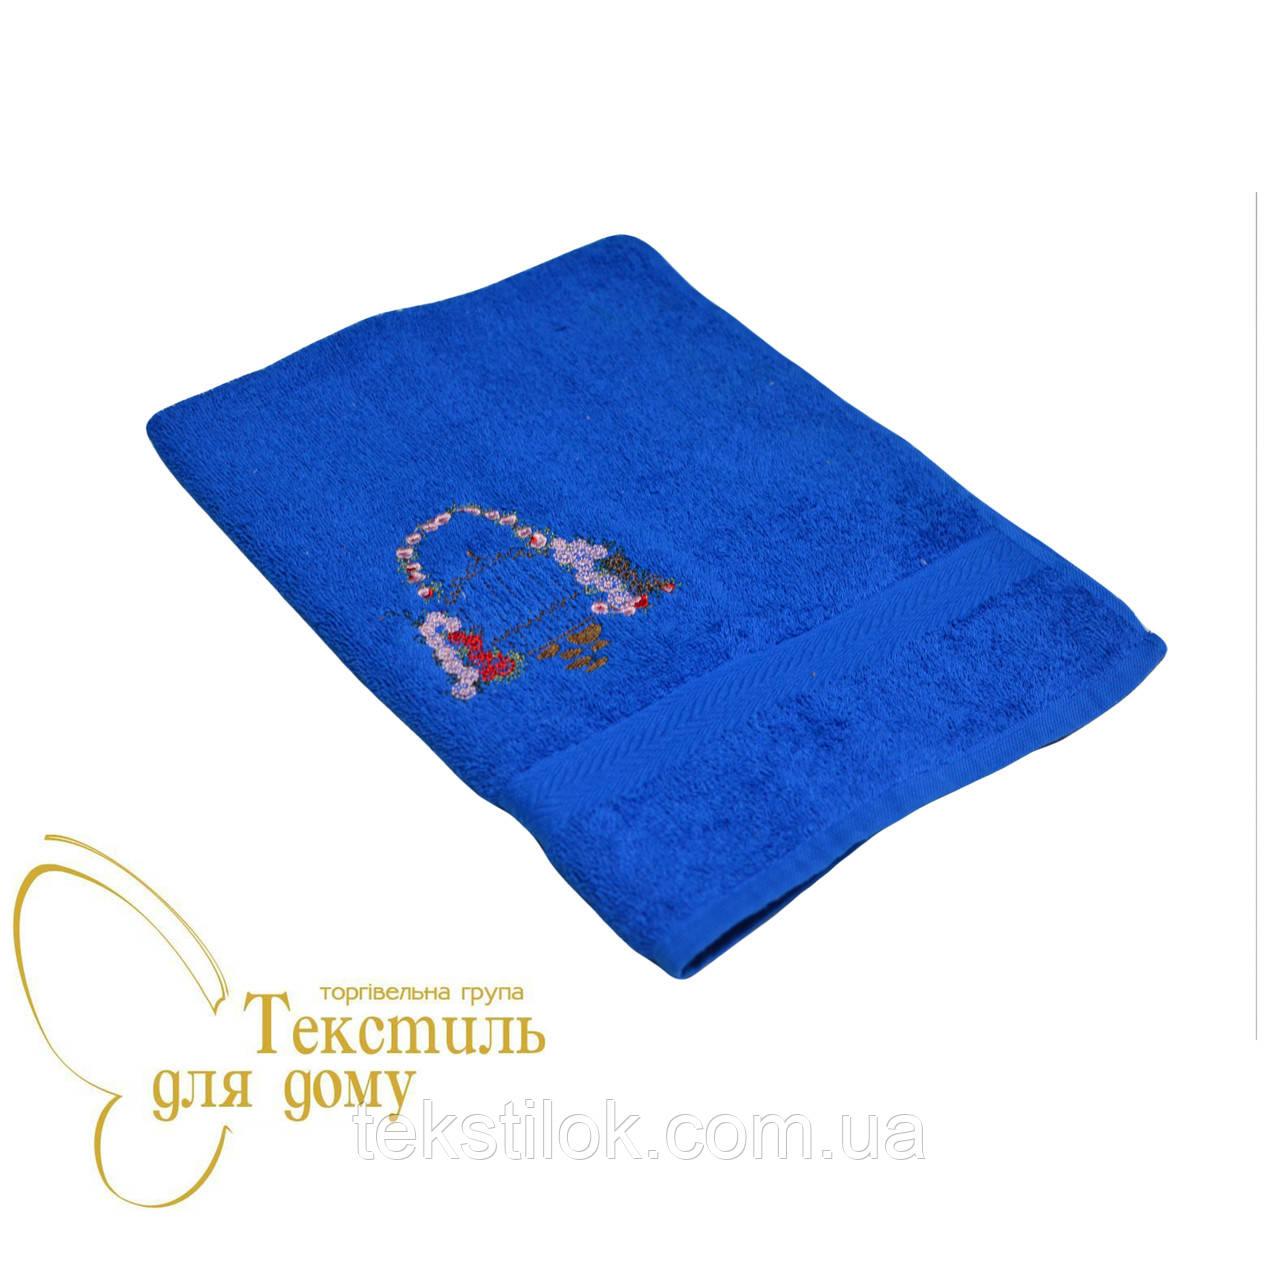 Полотенце для рук 40*70 вышивка букет, синий